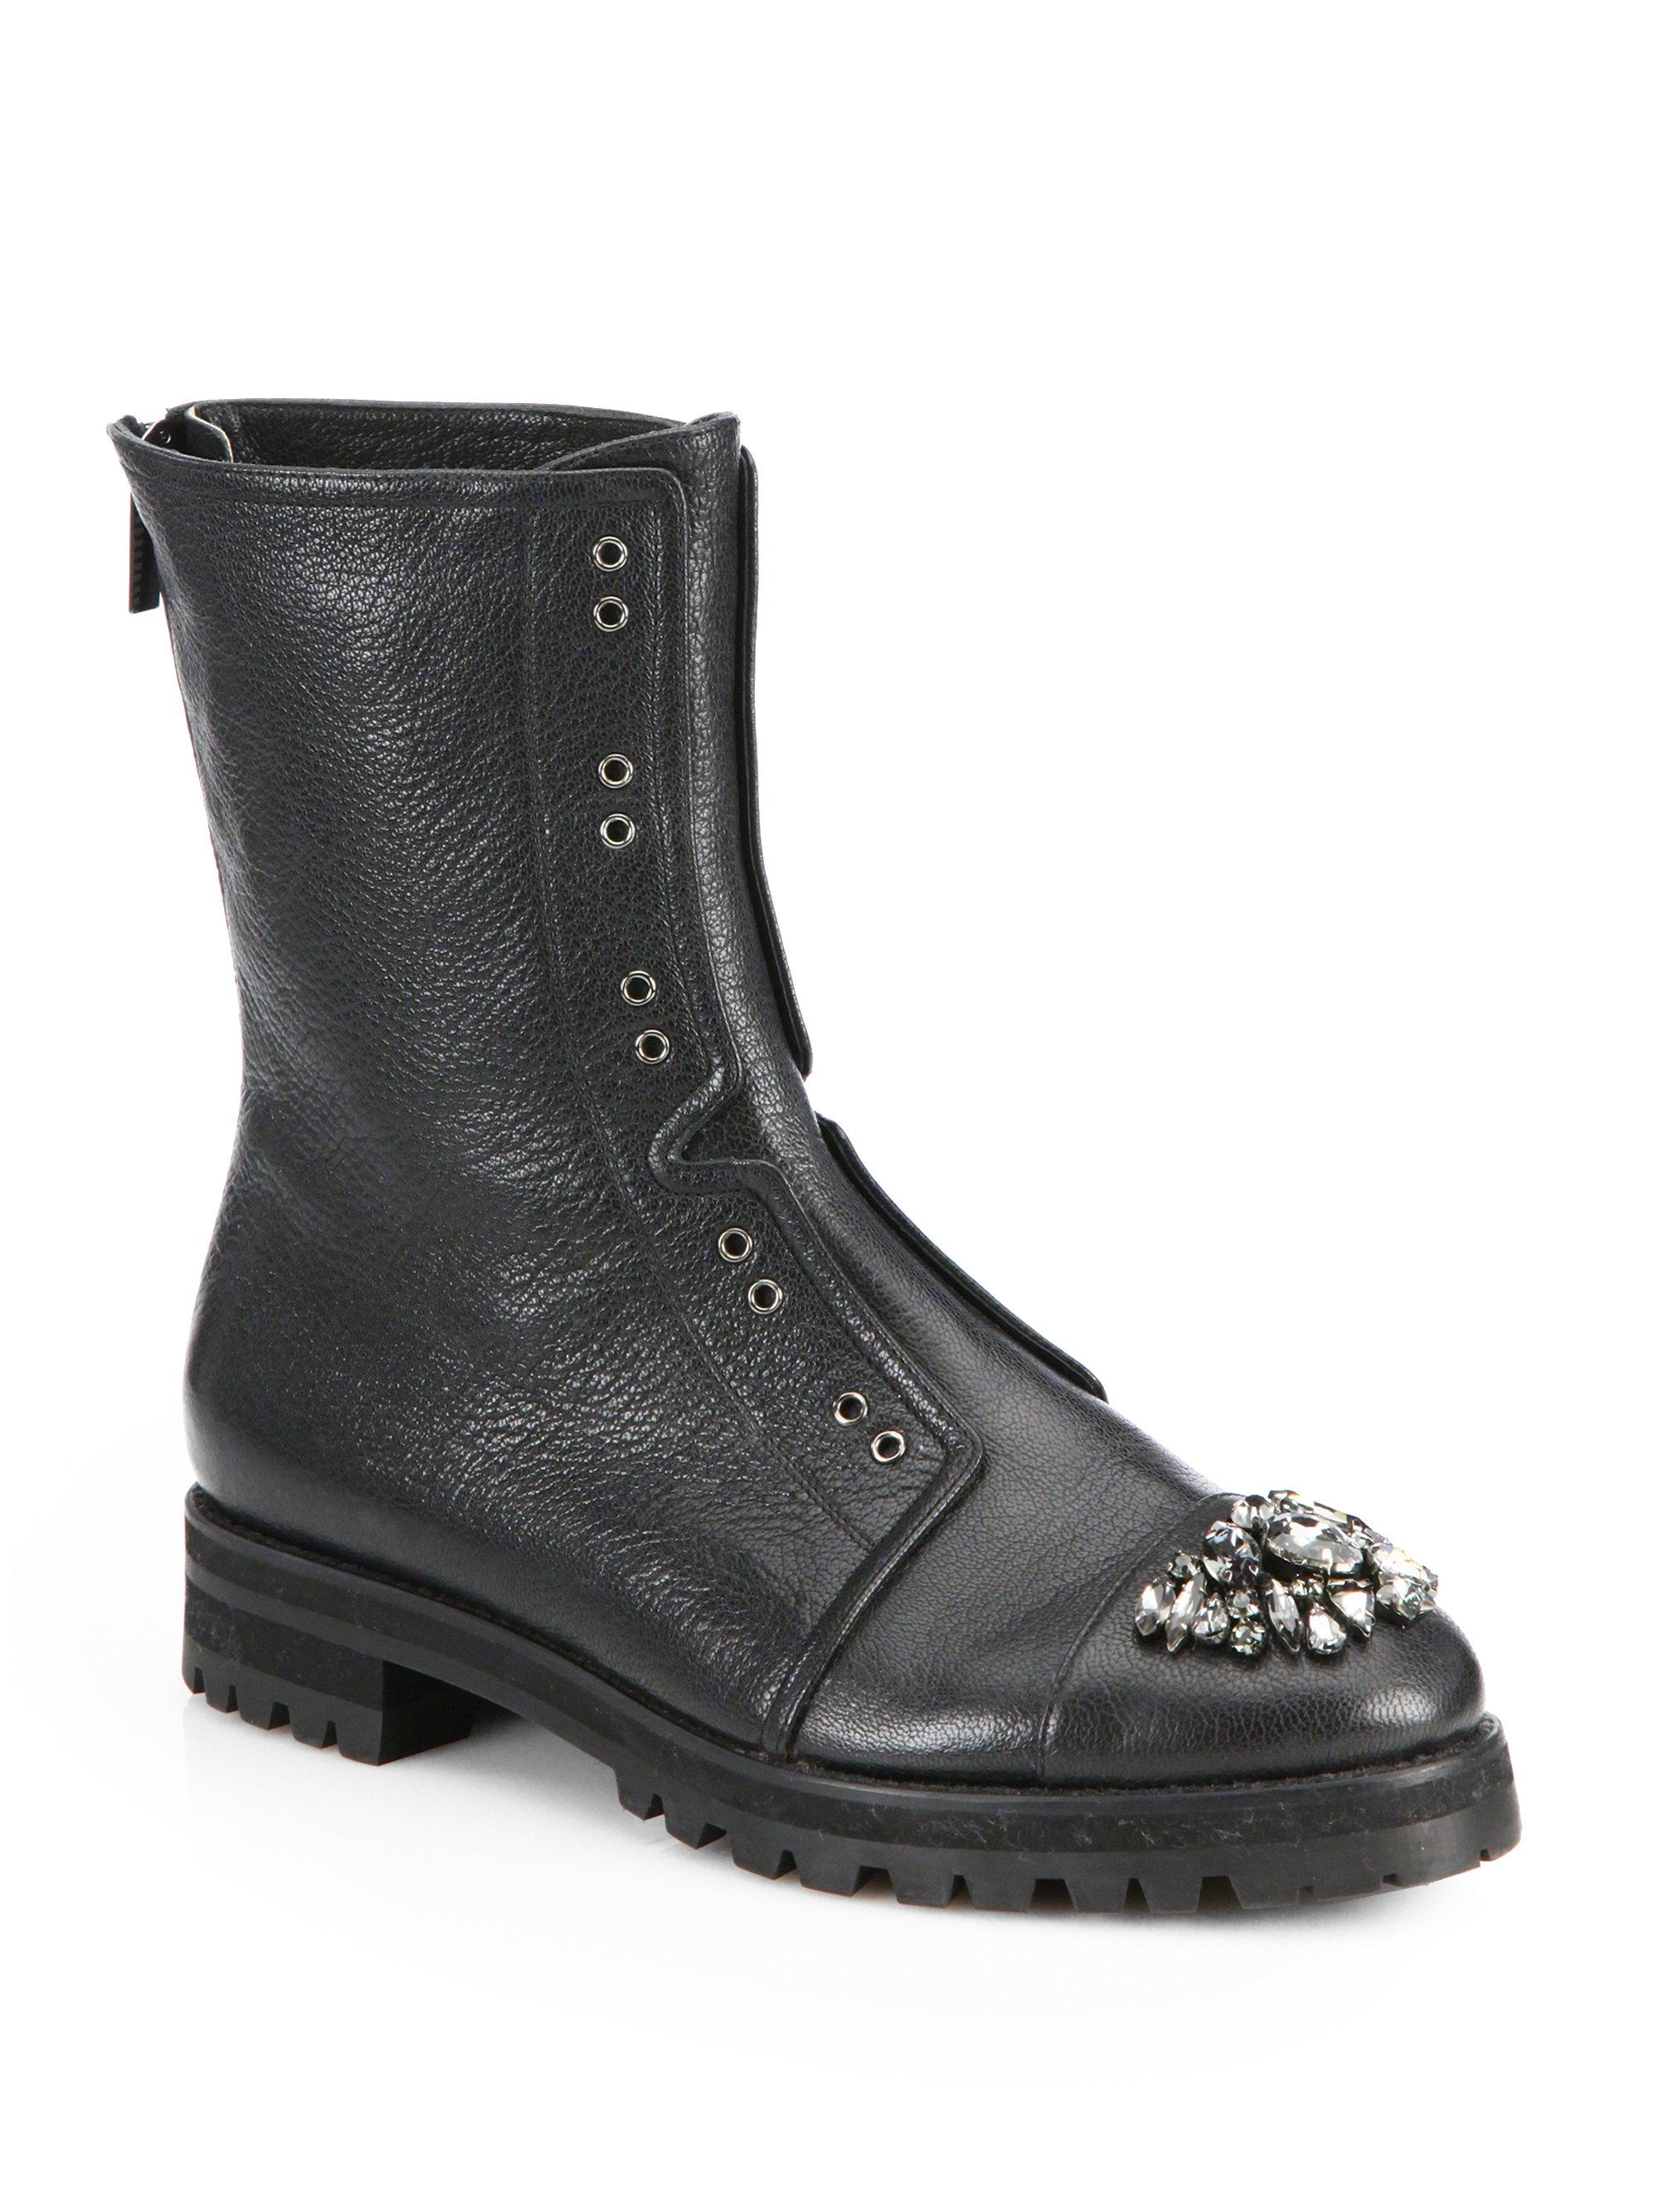 Jimmy Choo Hatcher Embellished Leather